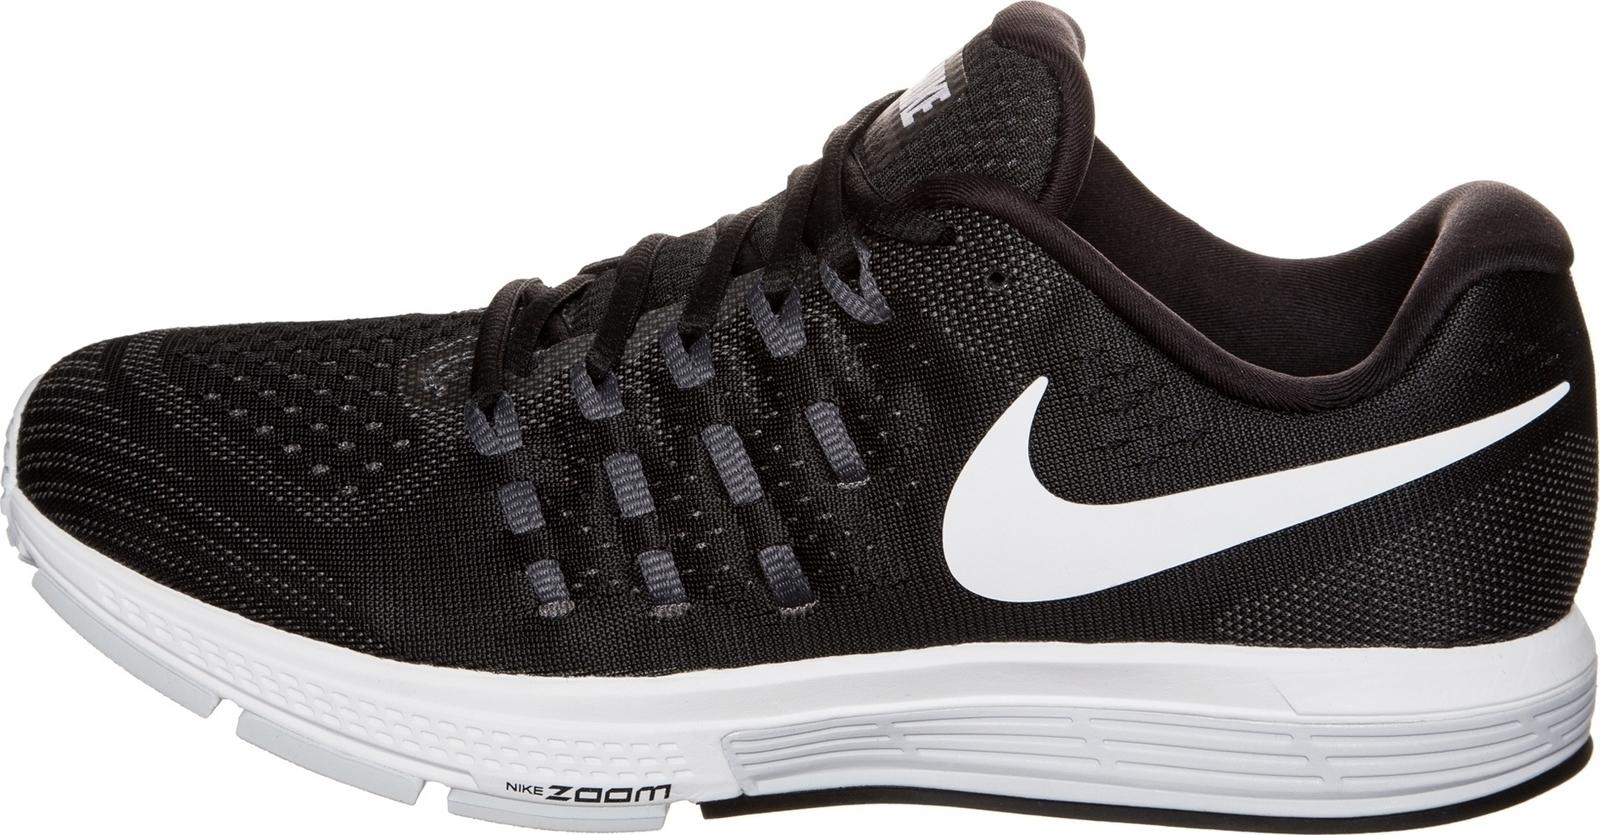 Nike Air Zoom Vomero 11 818099 001